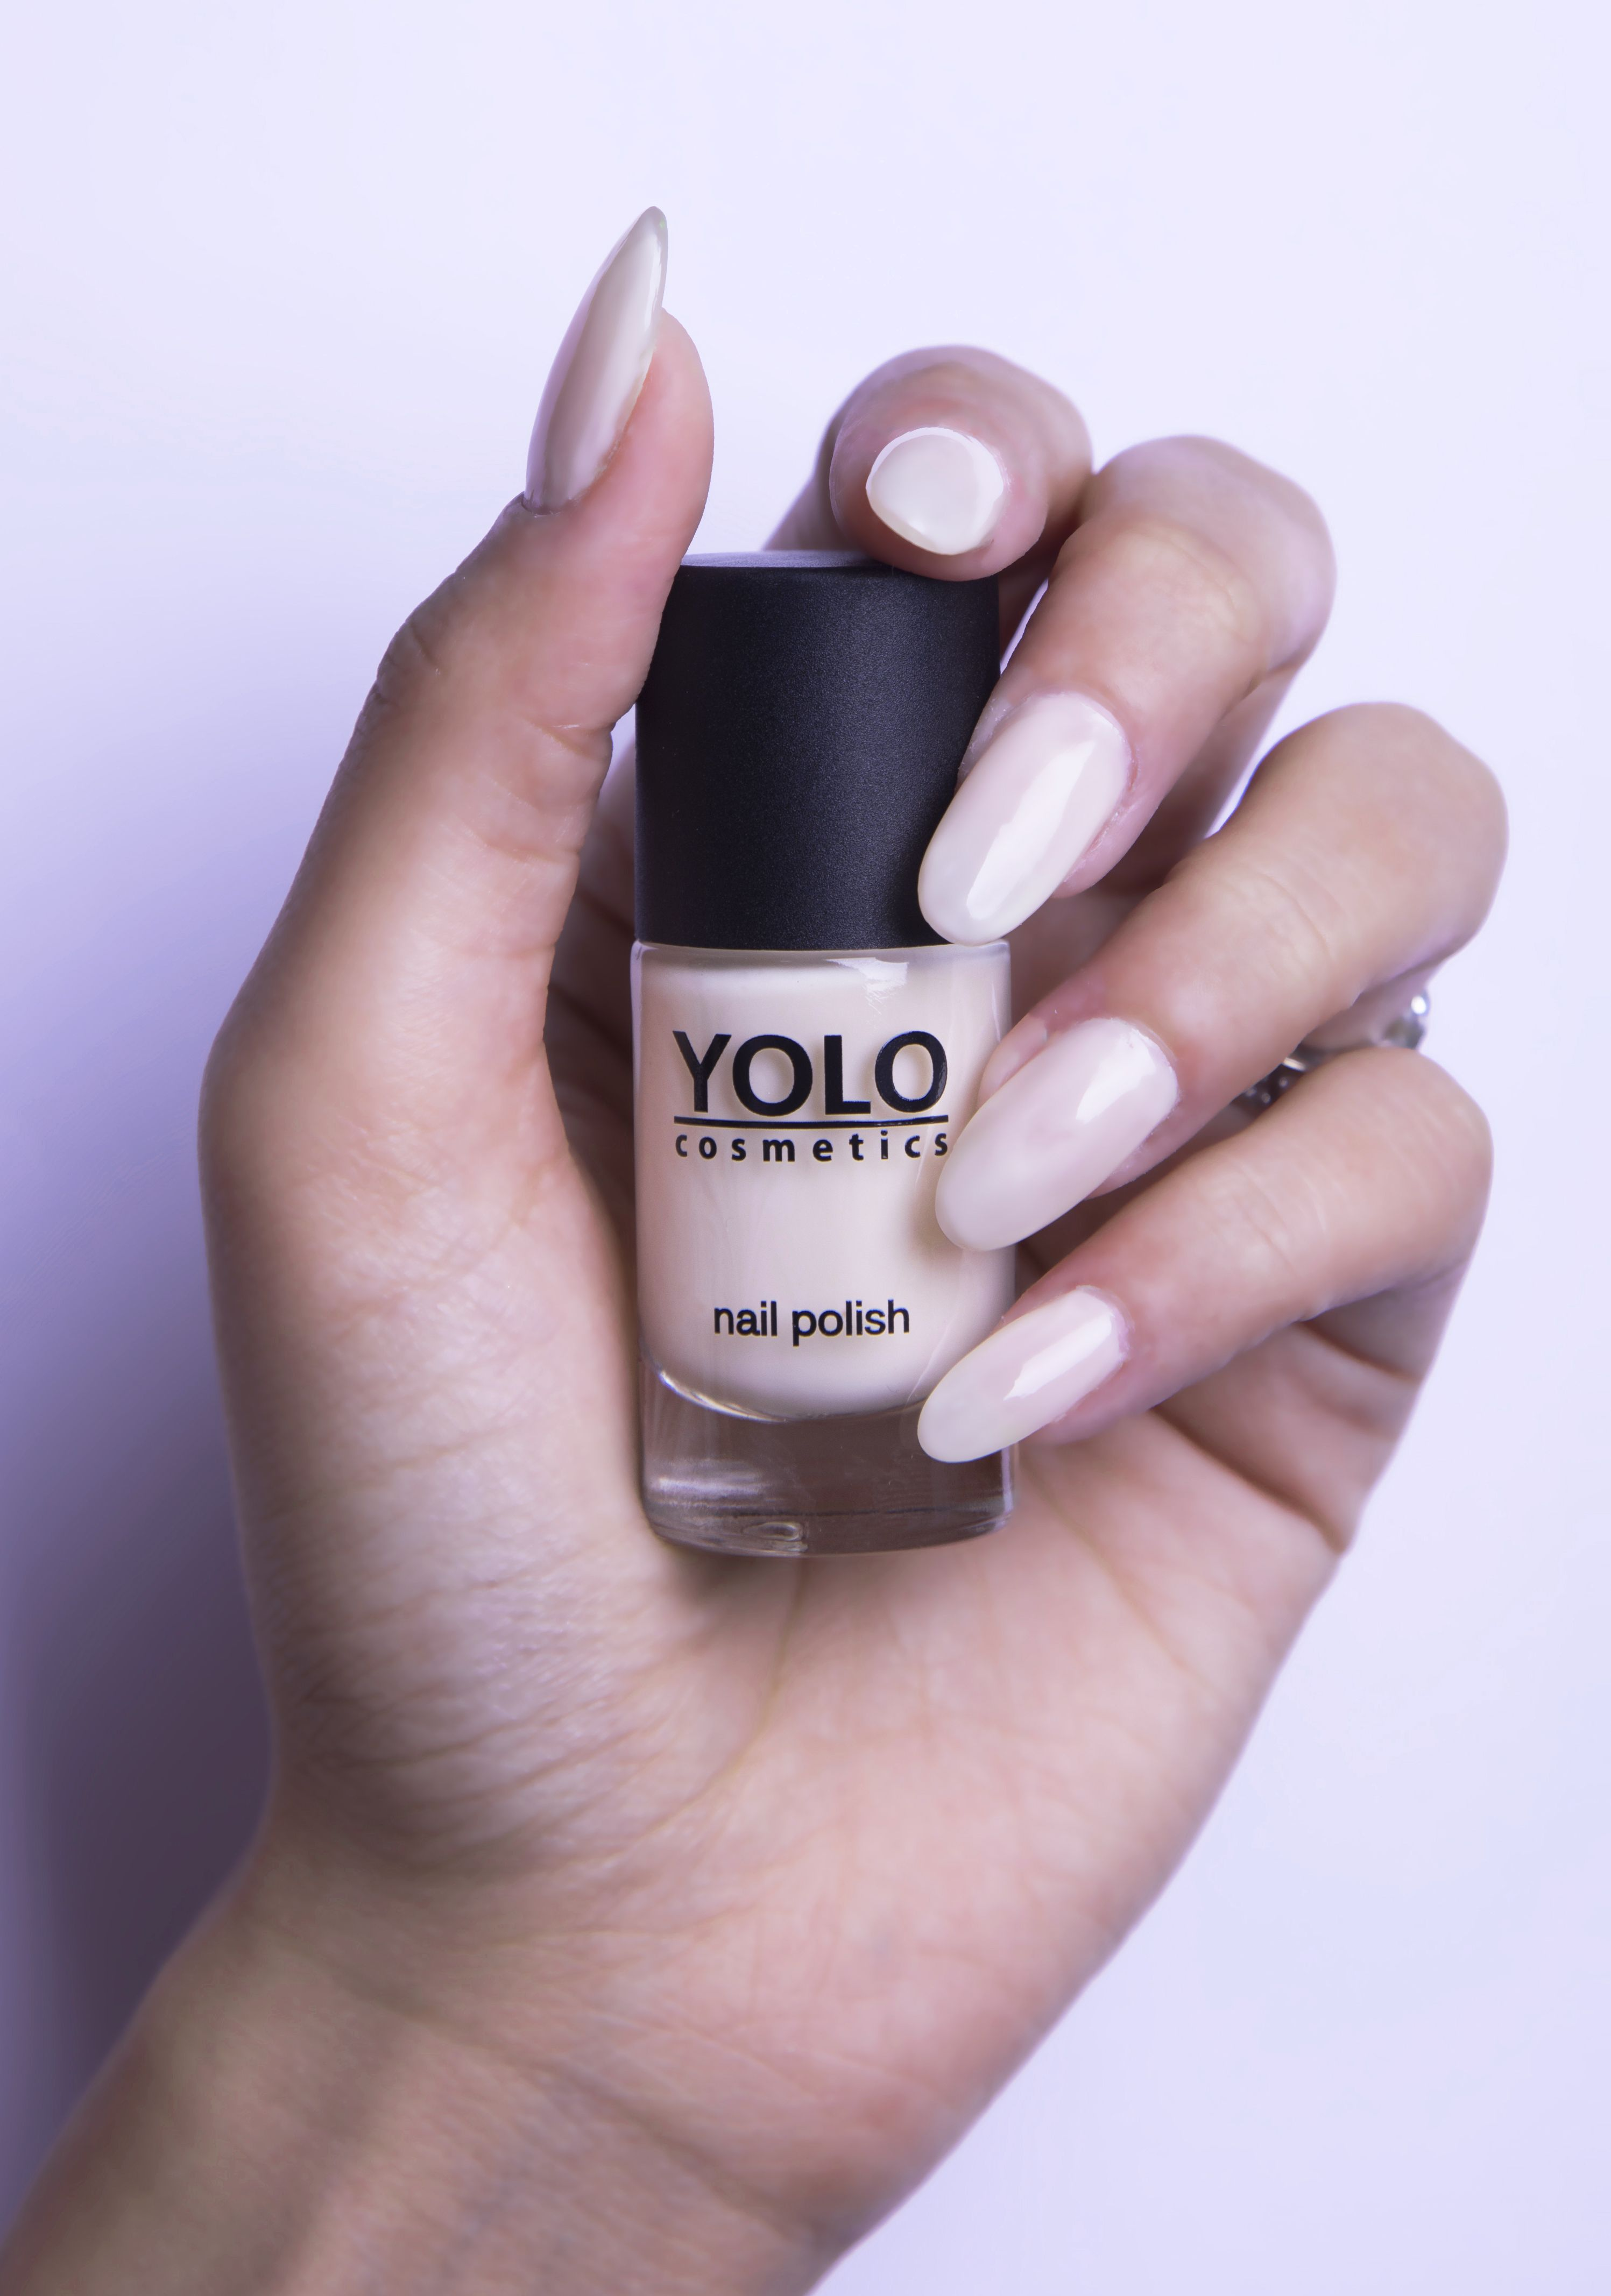 YOLOCosmeticsShades of White Code 102 YOLO Cosmetics